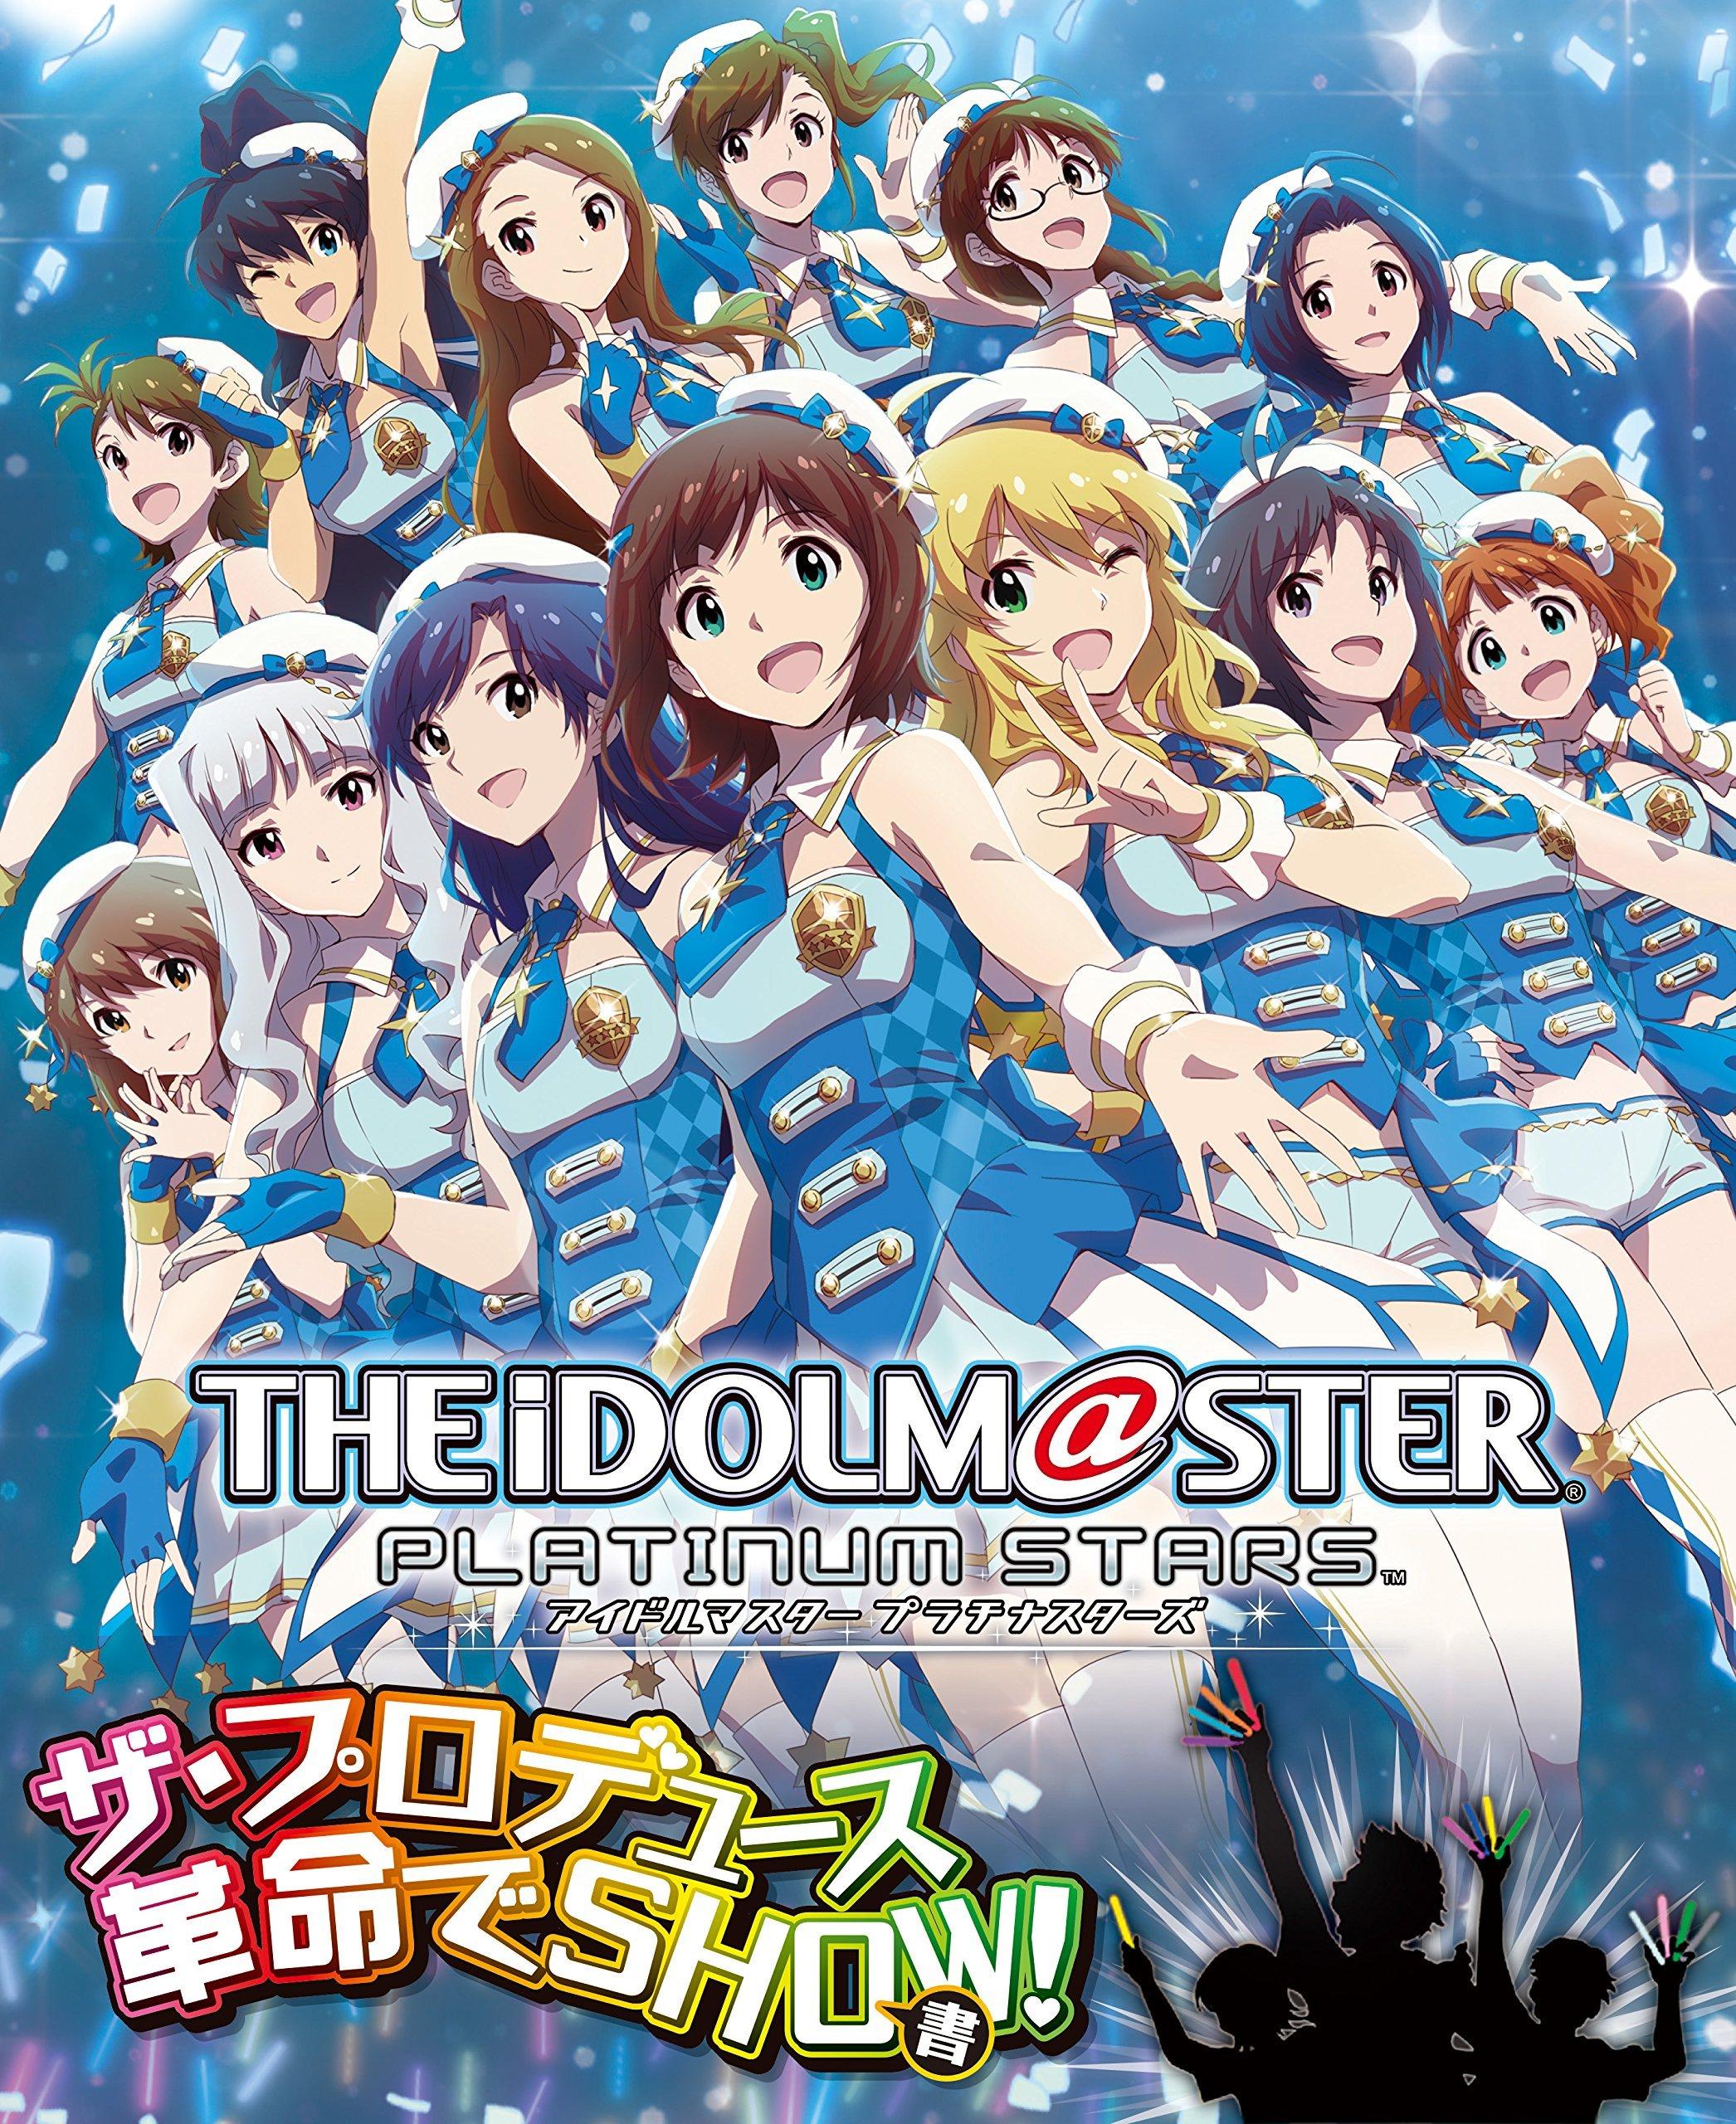 The Idolmaster - The Produce kakumei de SHOW sho (Vol.619 supplement) (August 11, 2016)